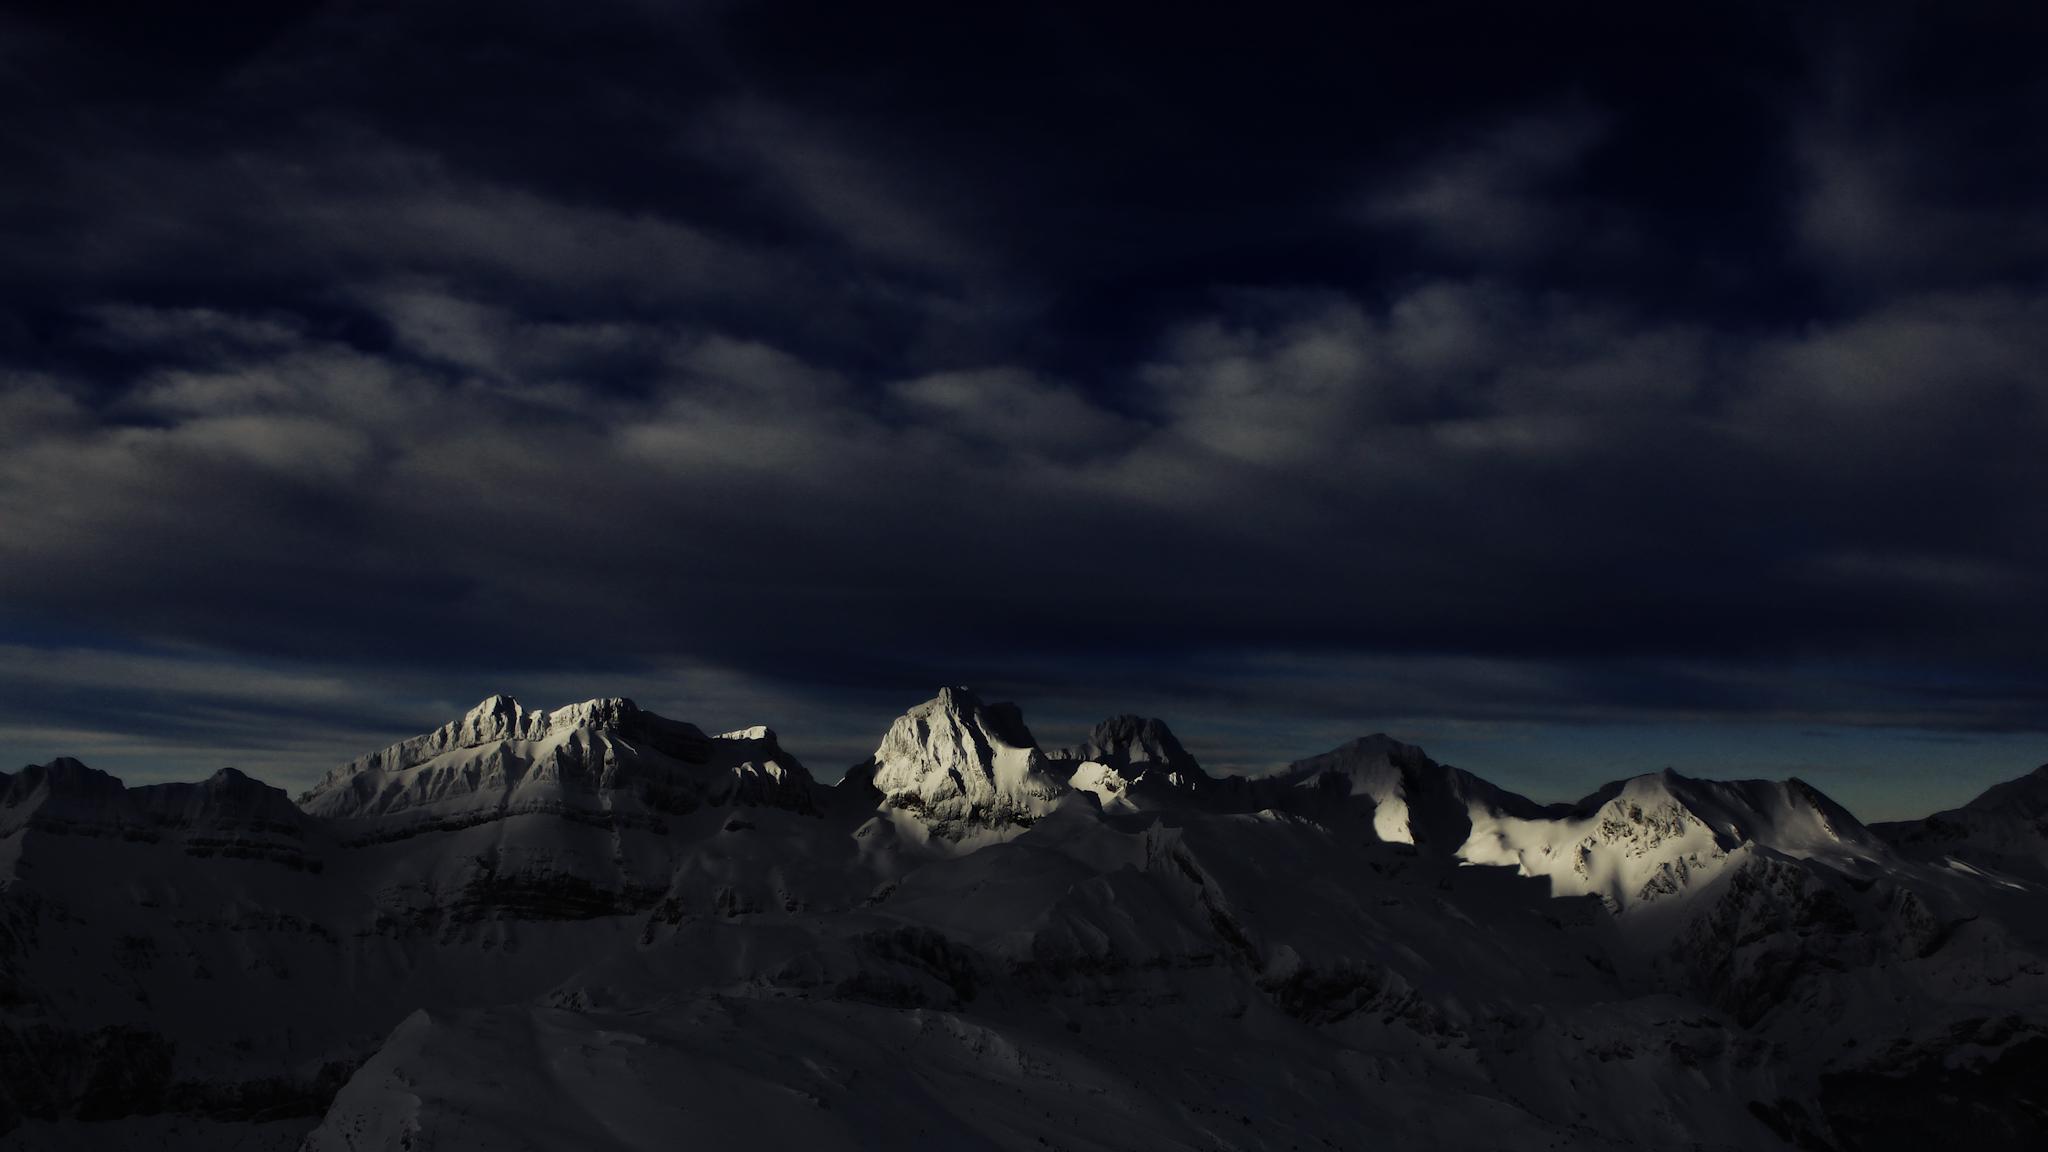 Luces de amanecer sobre el macizo del Aspe - Paisajes del valle - Fotos del Valle del Aragón, Mikel Besga